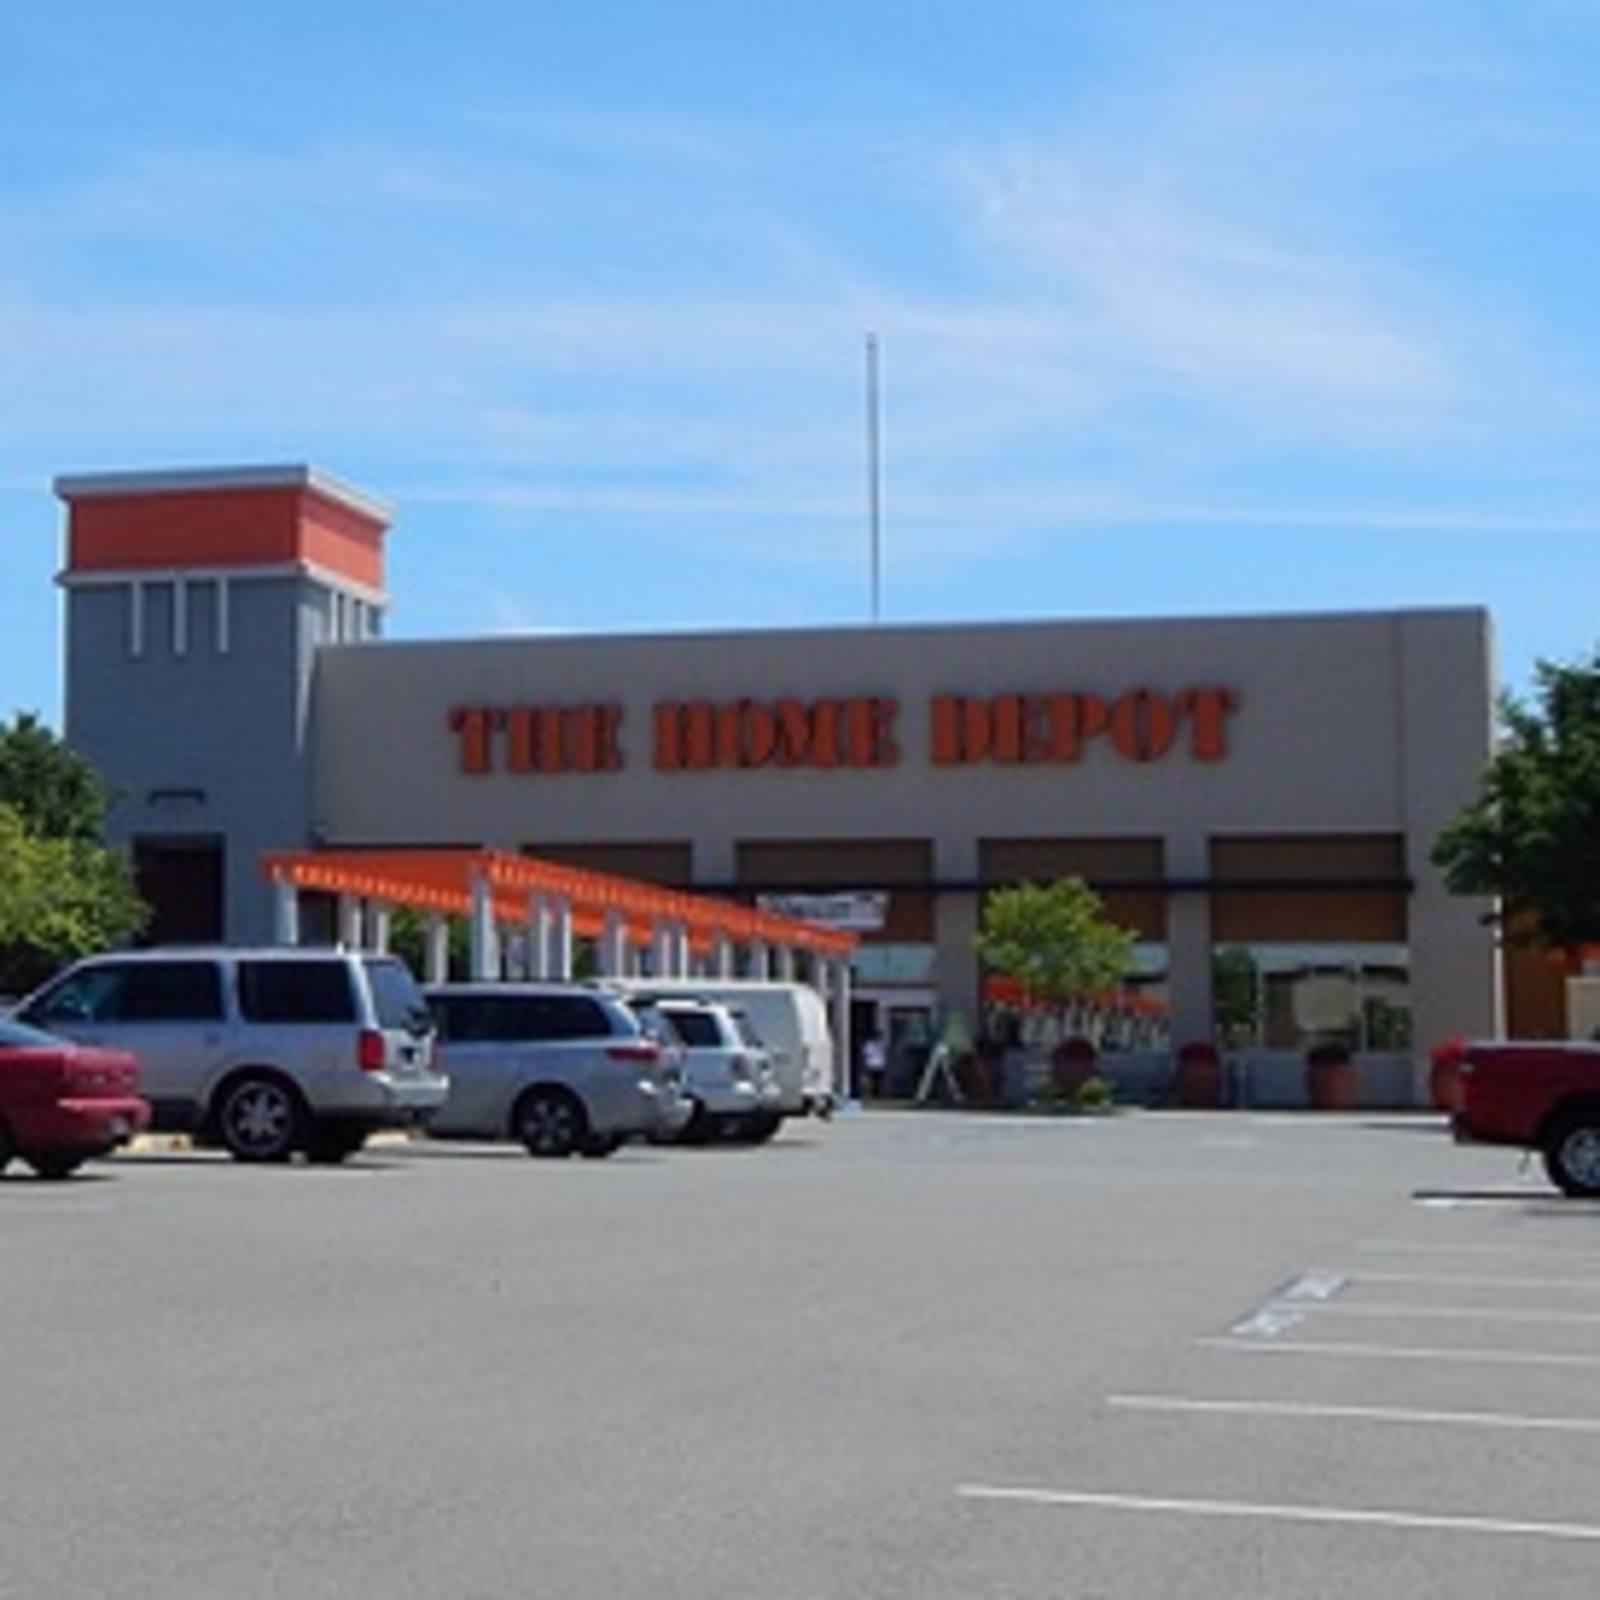 CBRE RetailRiverpoint MarketplaceReed Ave & I-80 E  Photo